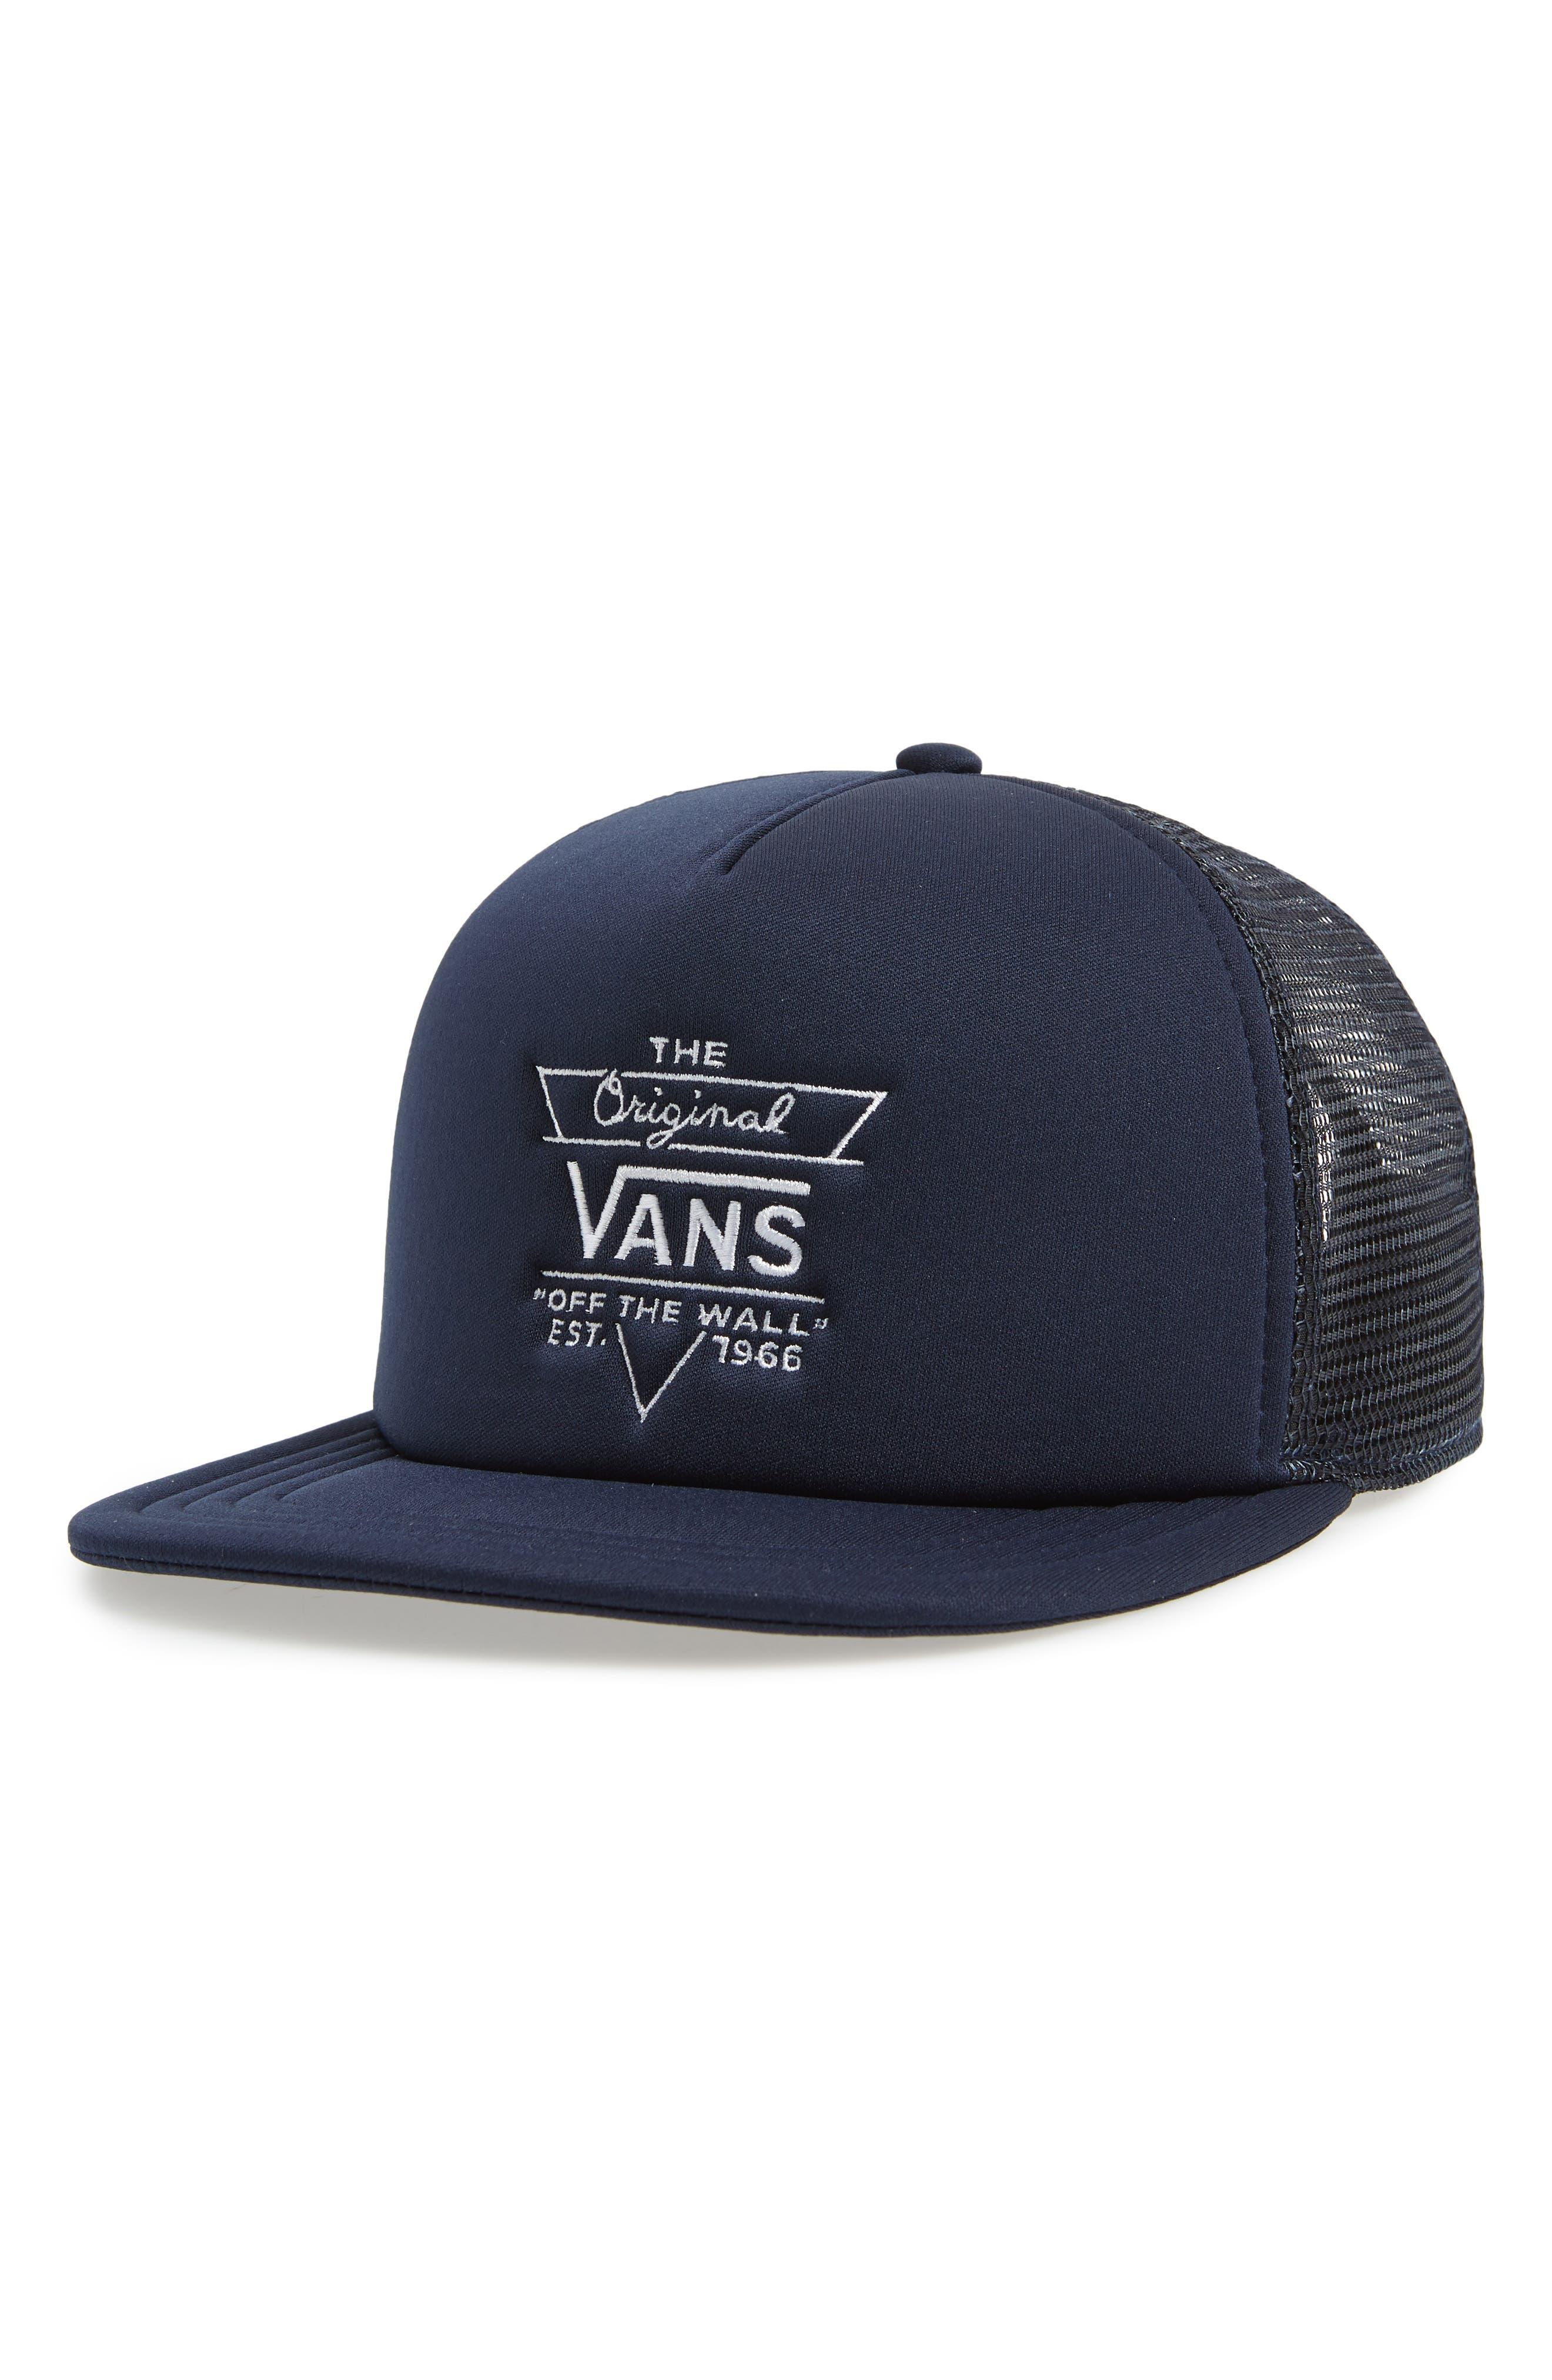 Vans Allendale Embroidered Trucker Hat